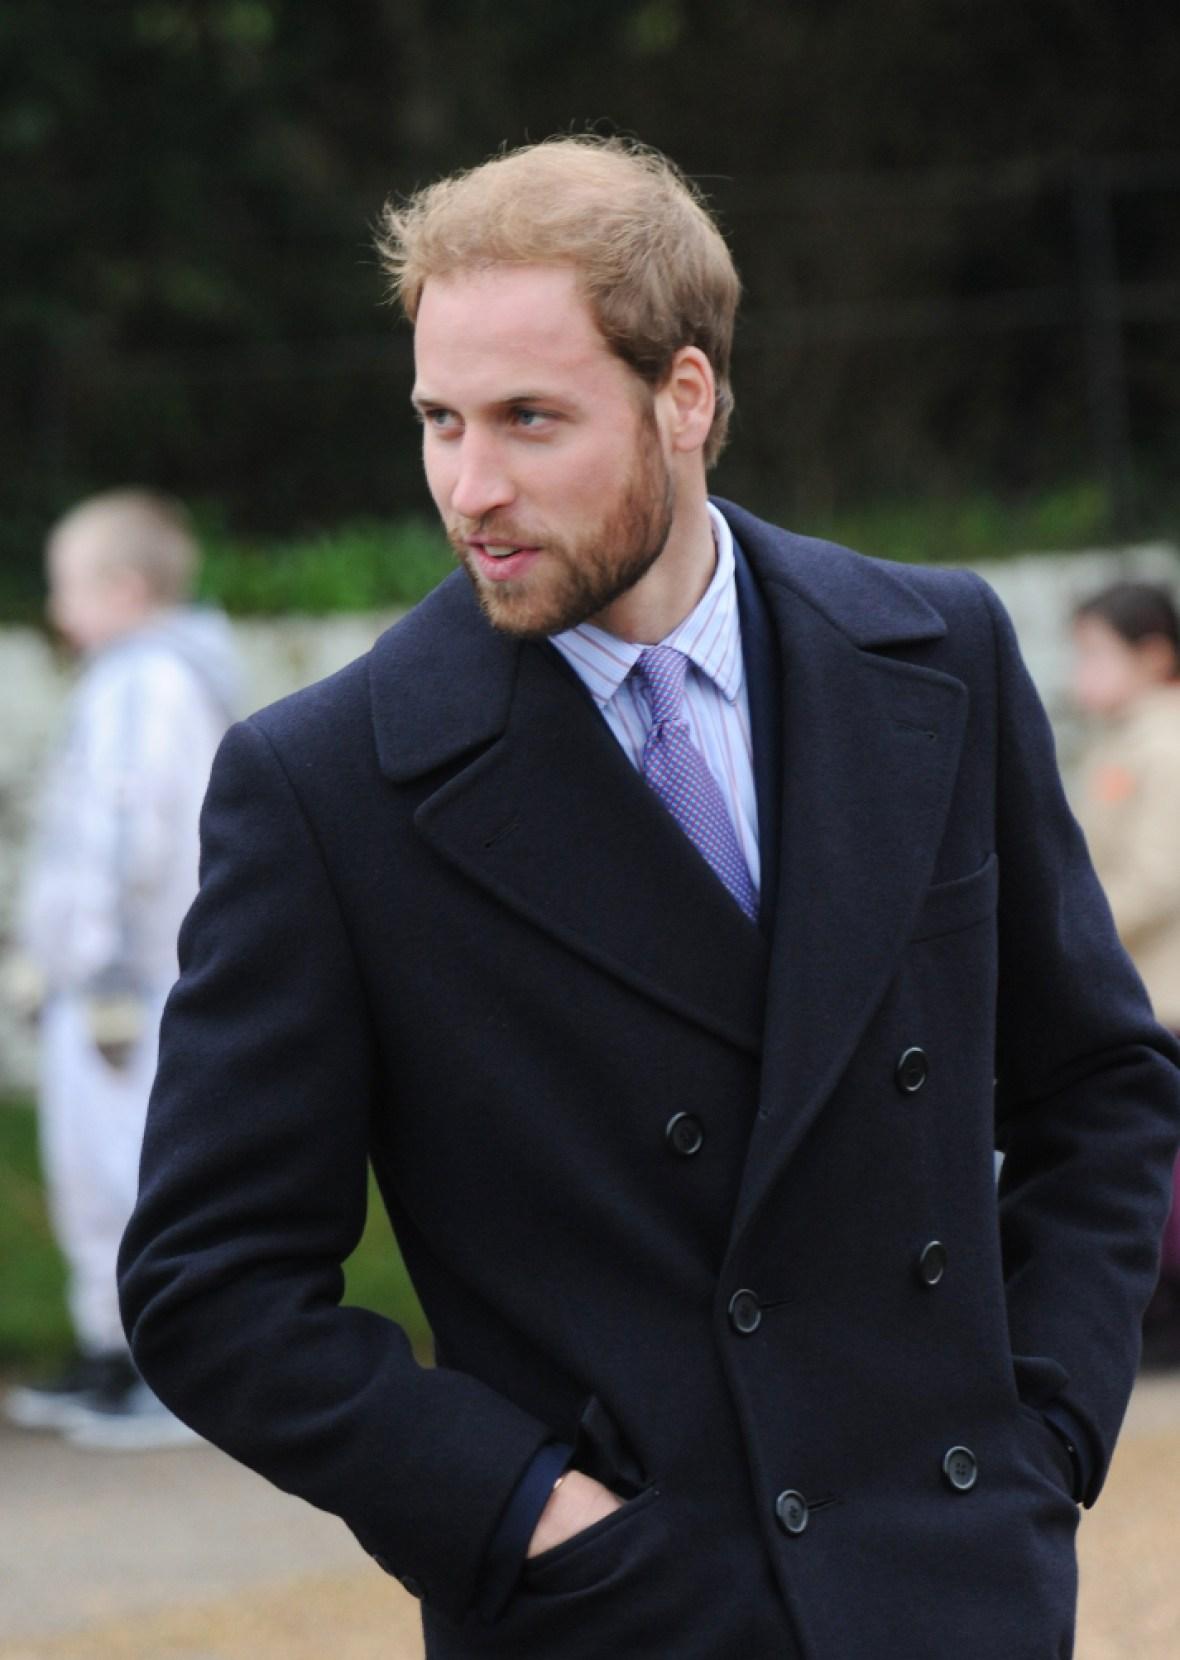 prince william 2008 - getty